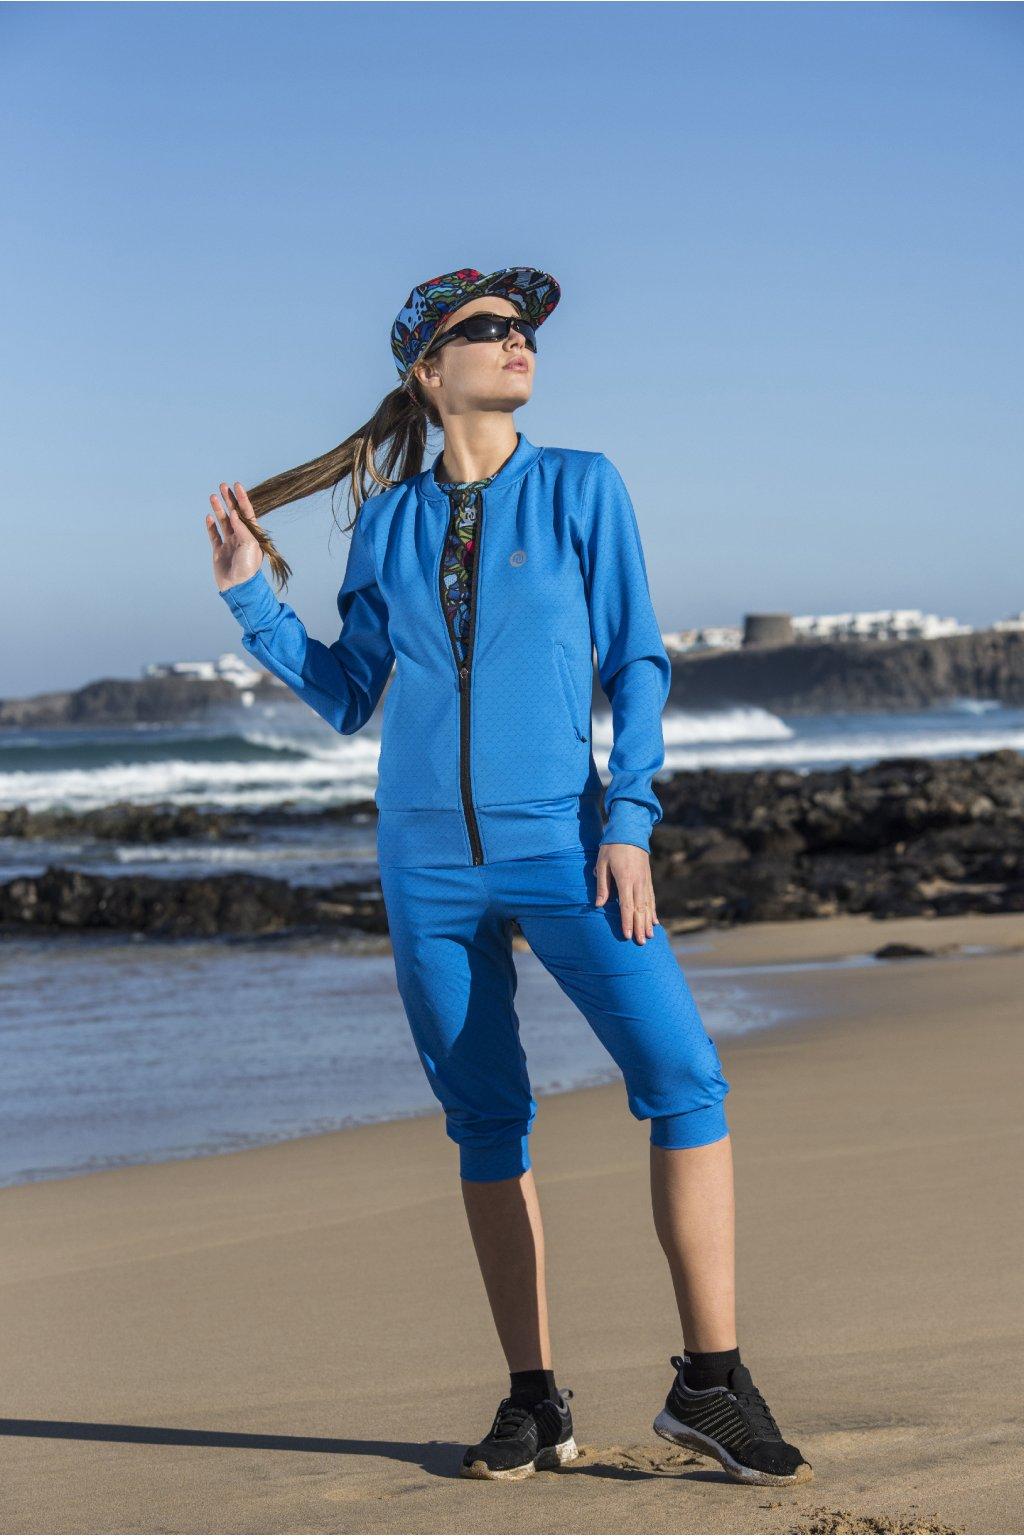 bomberka blue mirage nvl 11x7 wiosna lato 2020 1